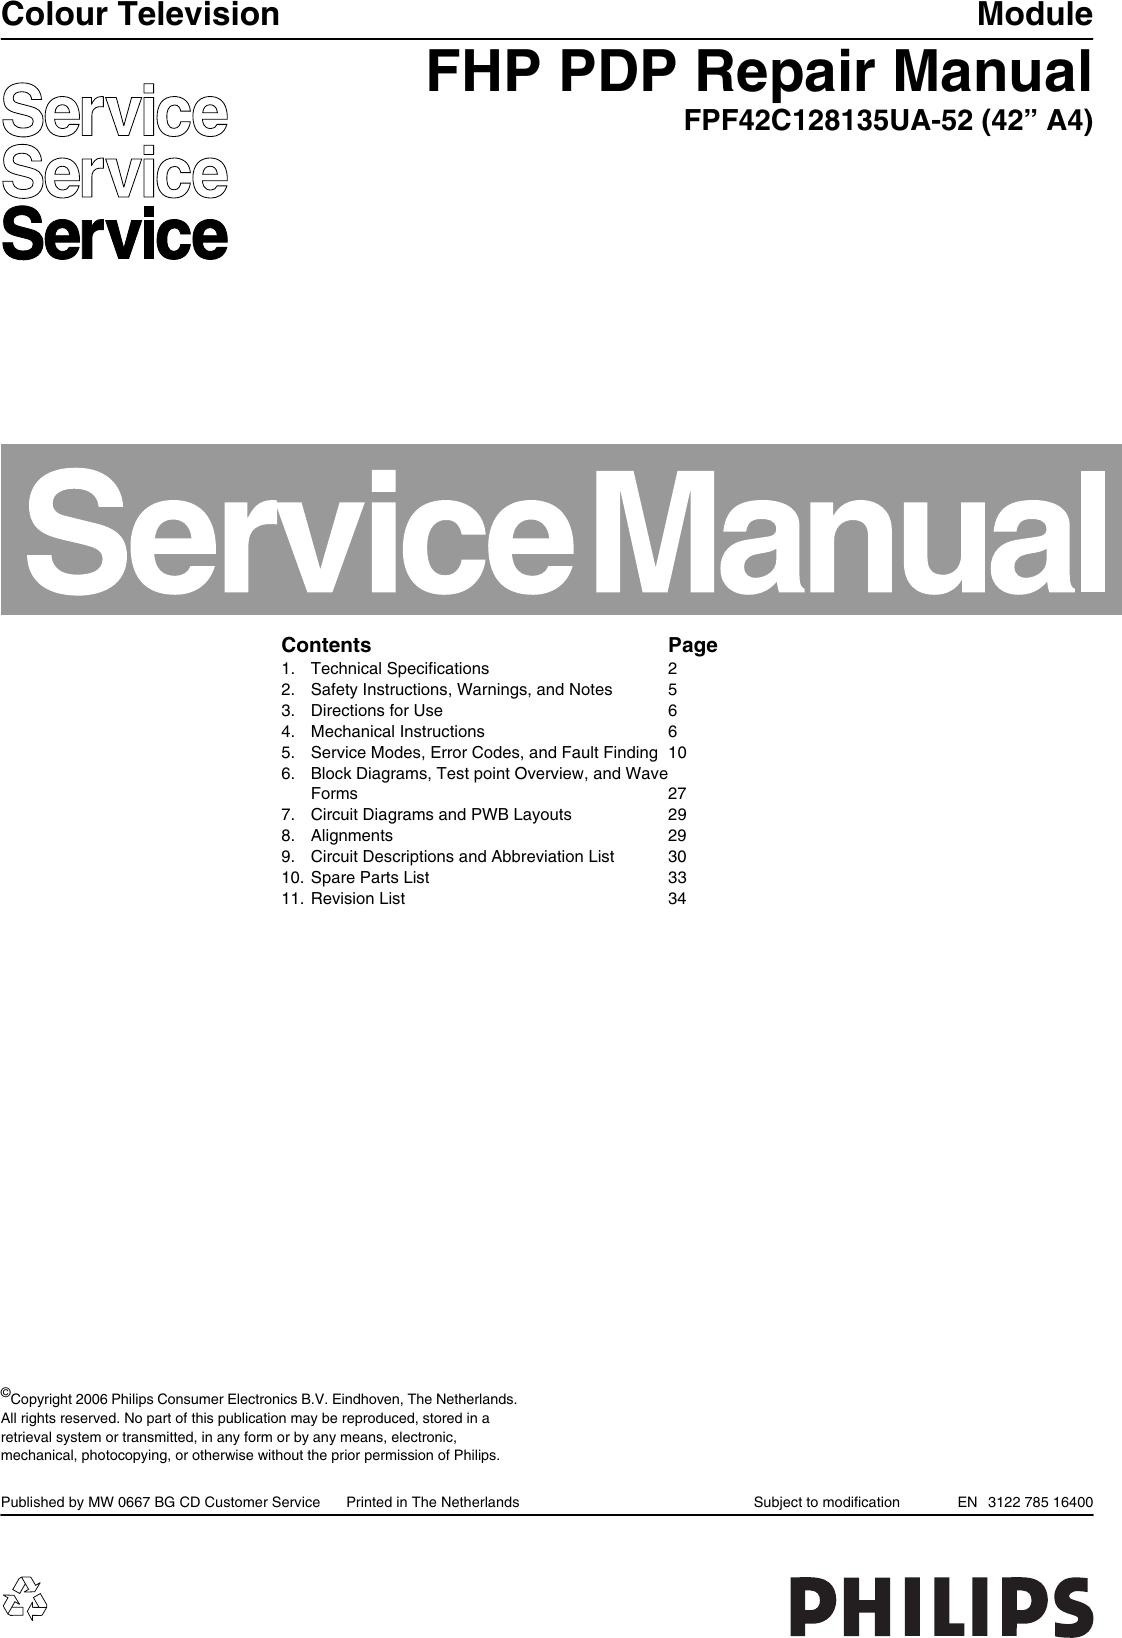 Philips Fpf42c128135ua 52 Users Manual Fhp Pdp 312278516400 Colour T V Circuit Diagram